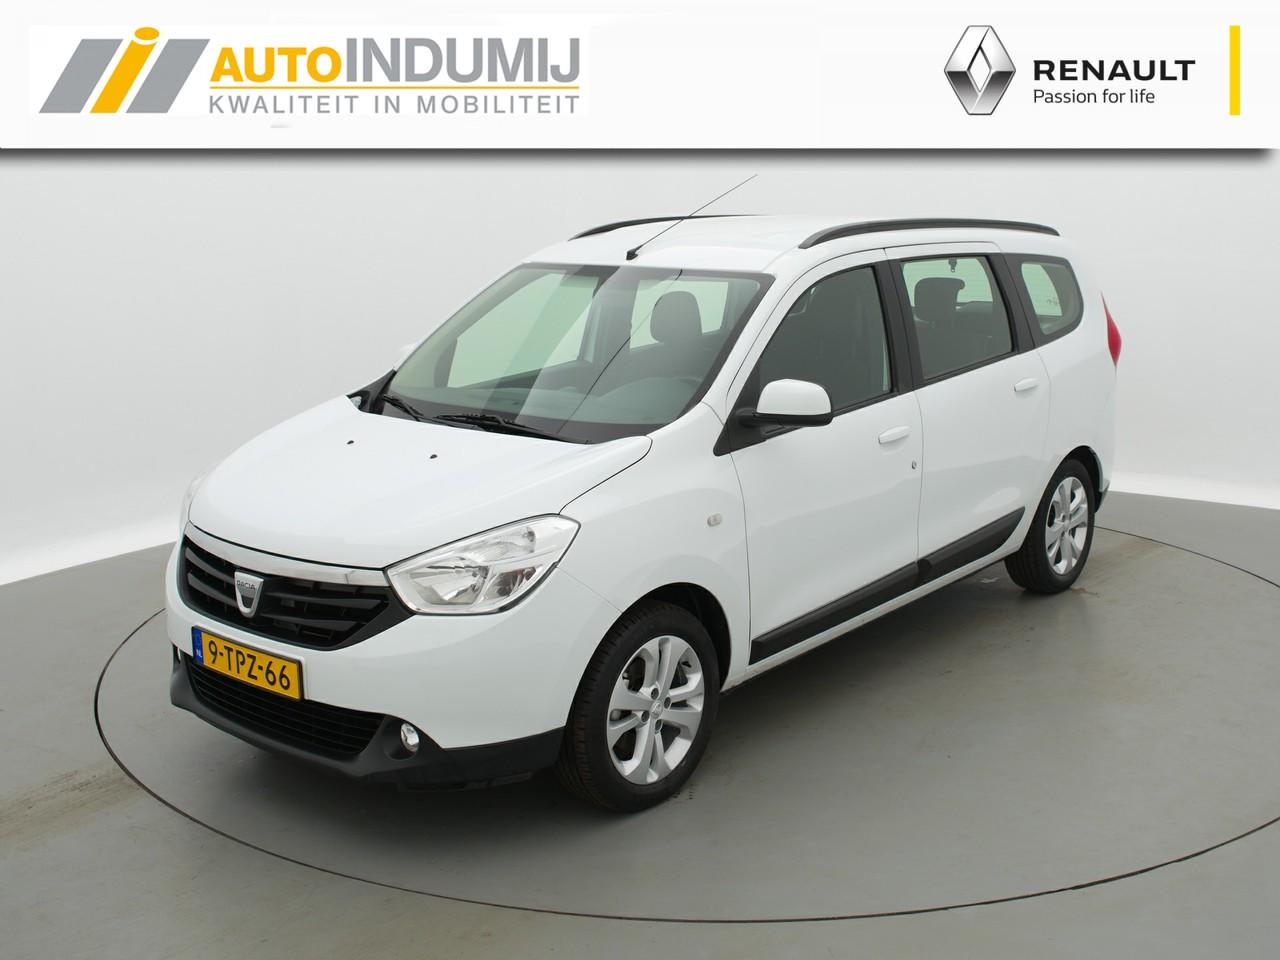 Dacia Lodgy 1.2 tce prestige 5p. / navigatie / airco / pdc